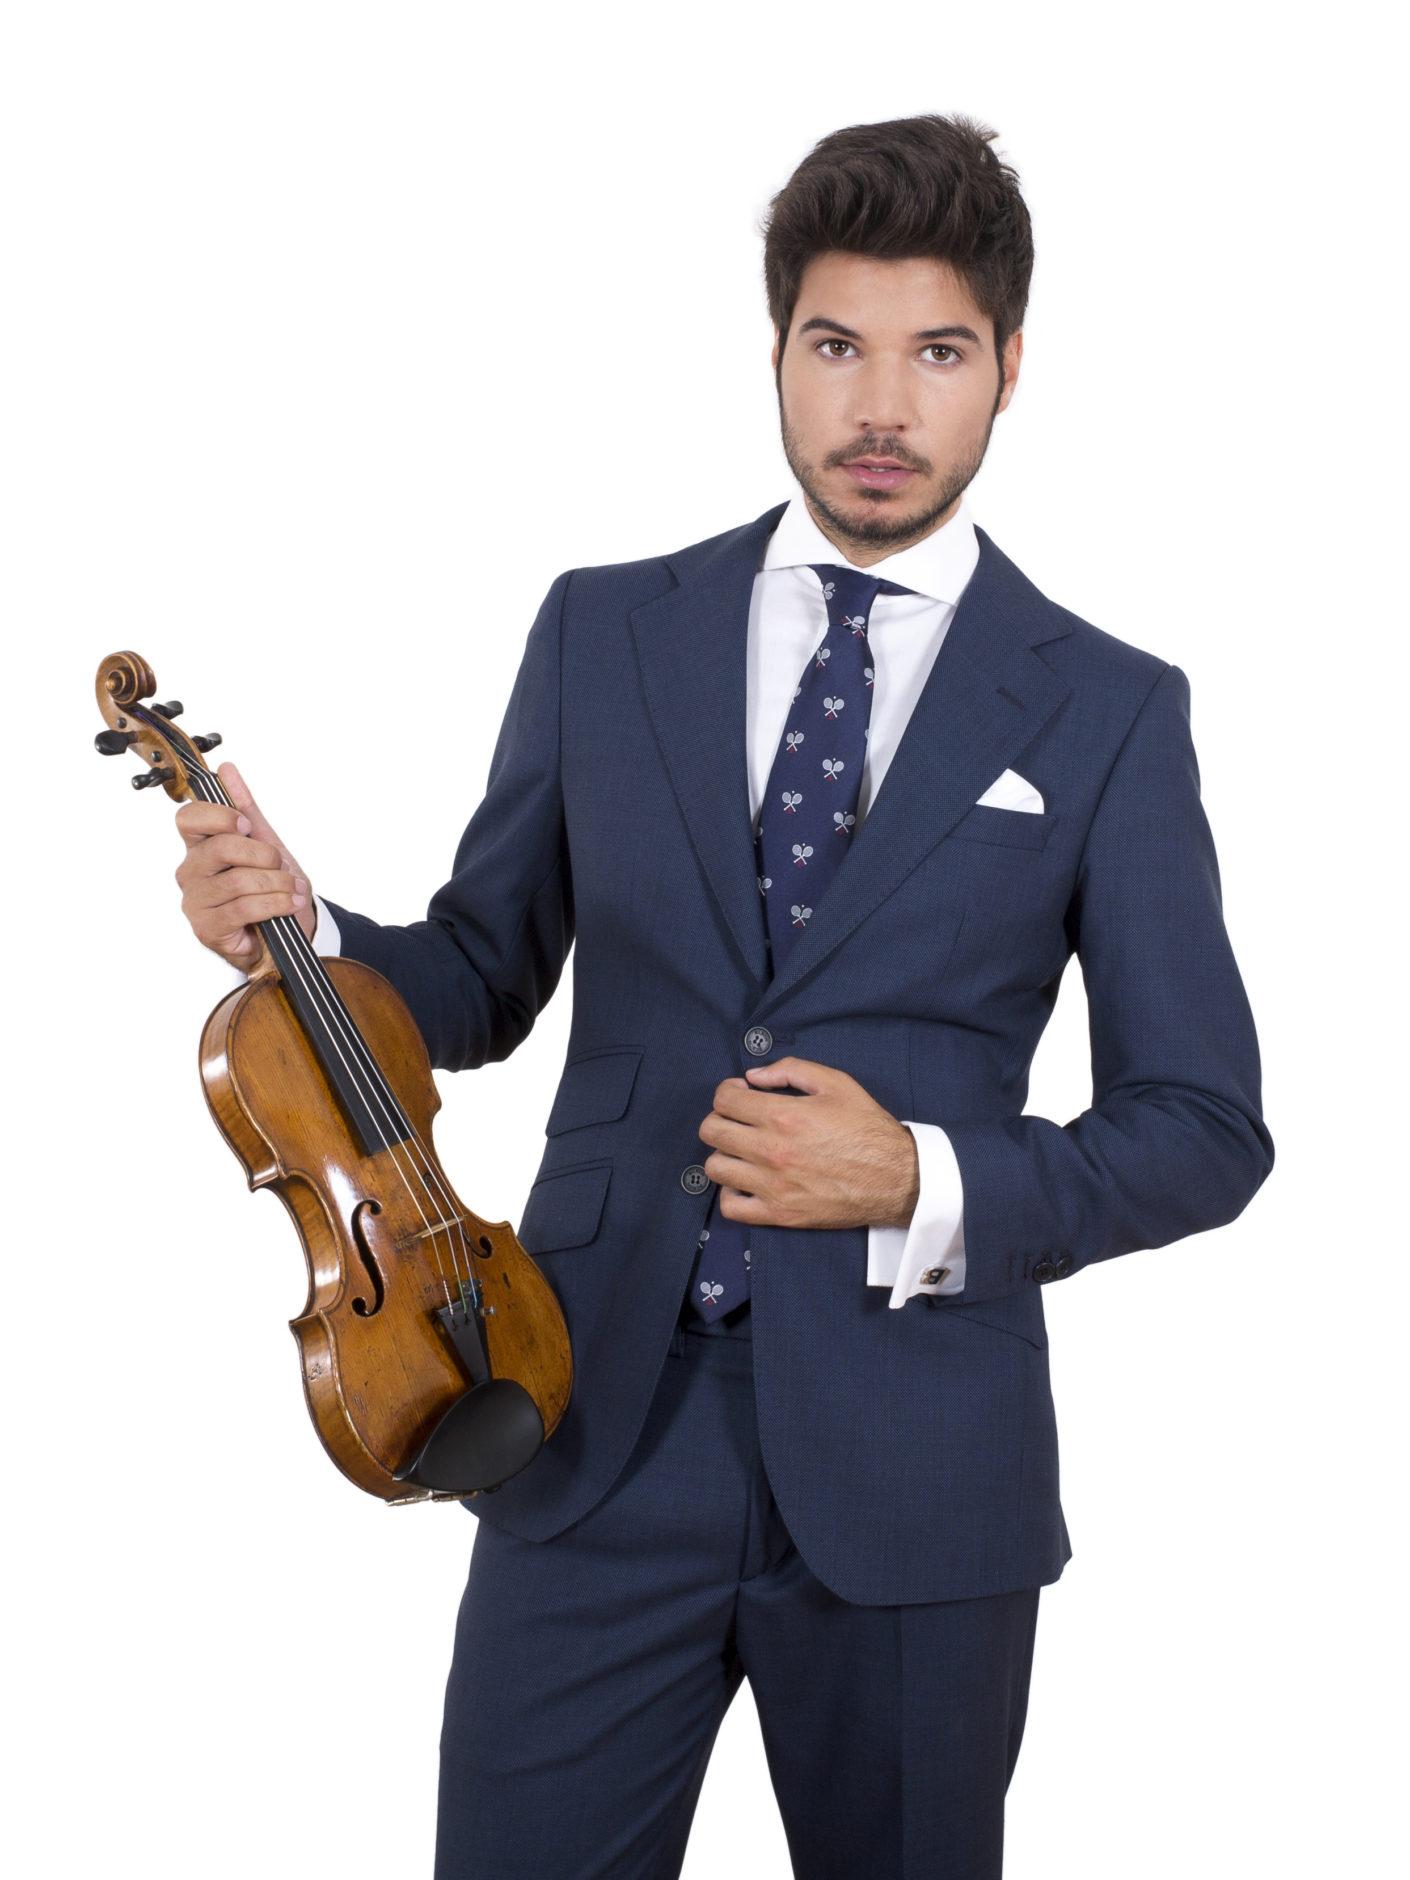 Paco Montalvo – Alma del violín flamenco 2